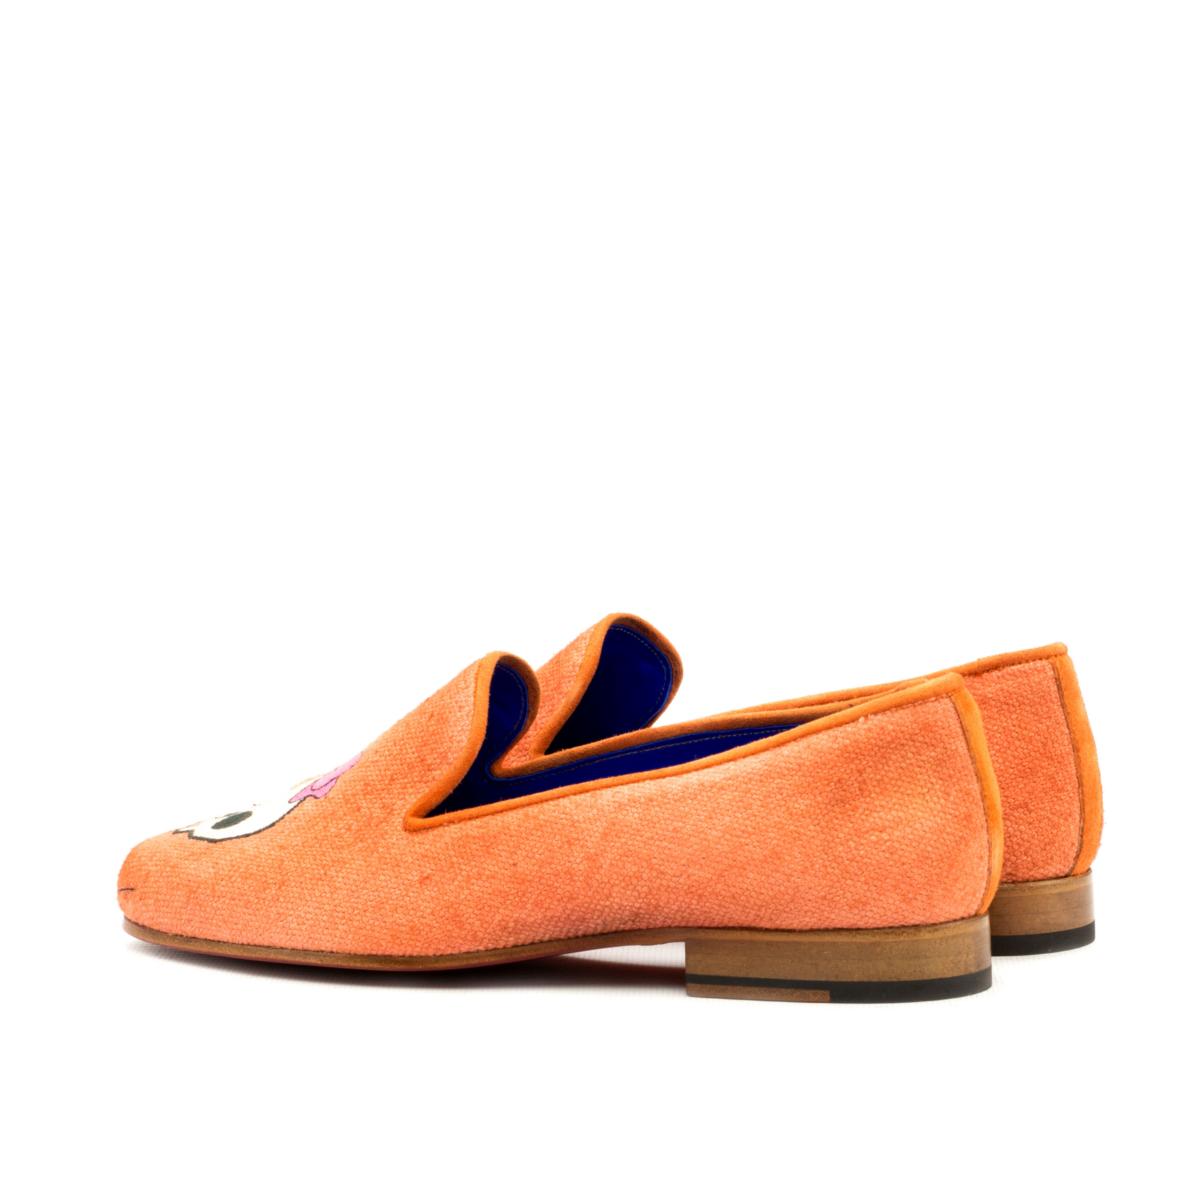 Orange linen women's Slippers